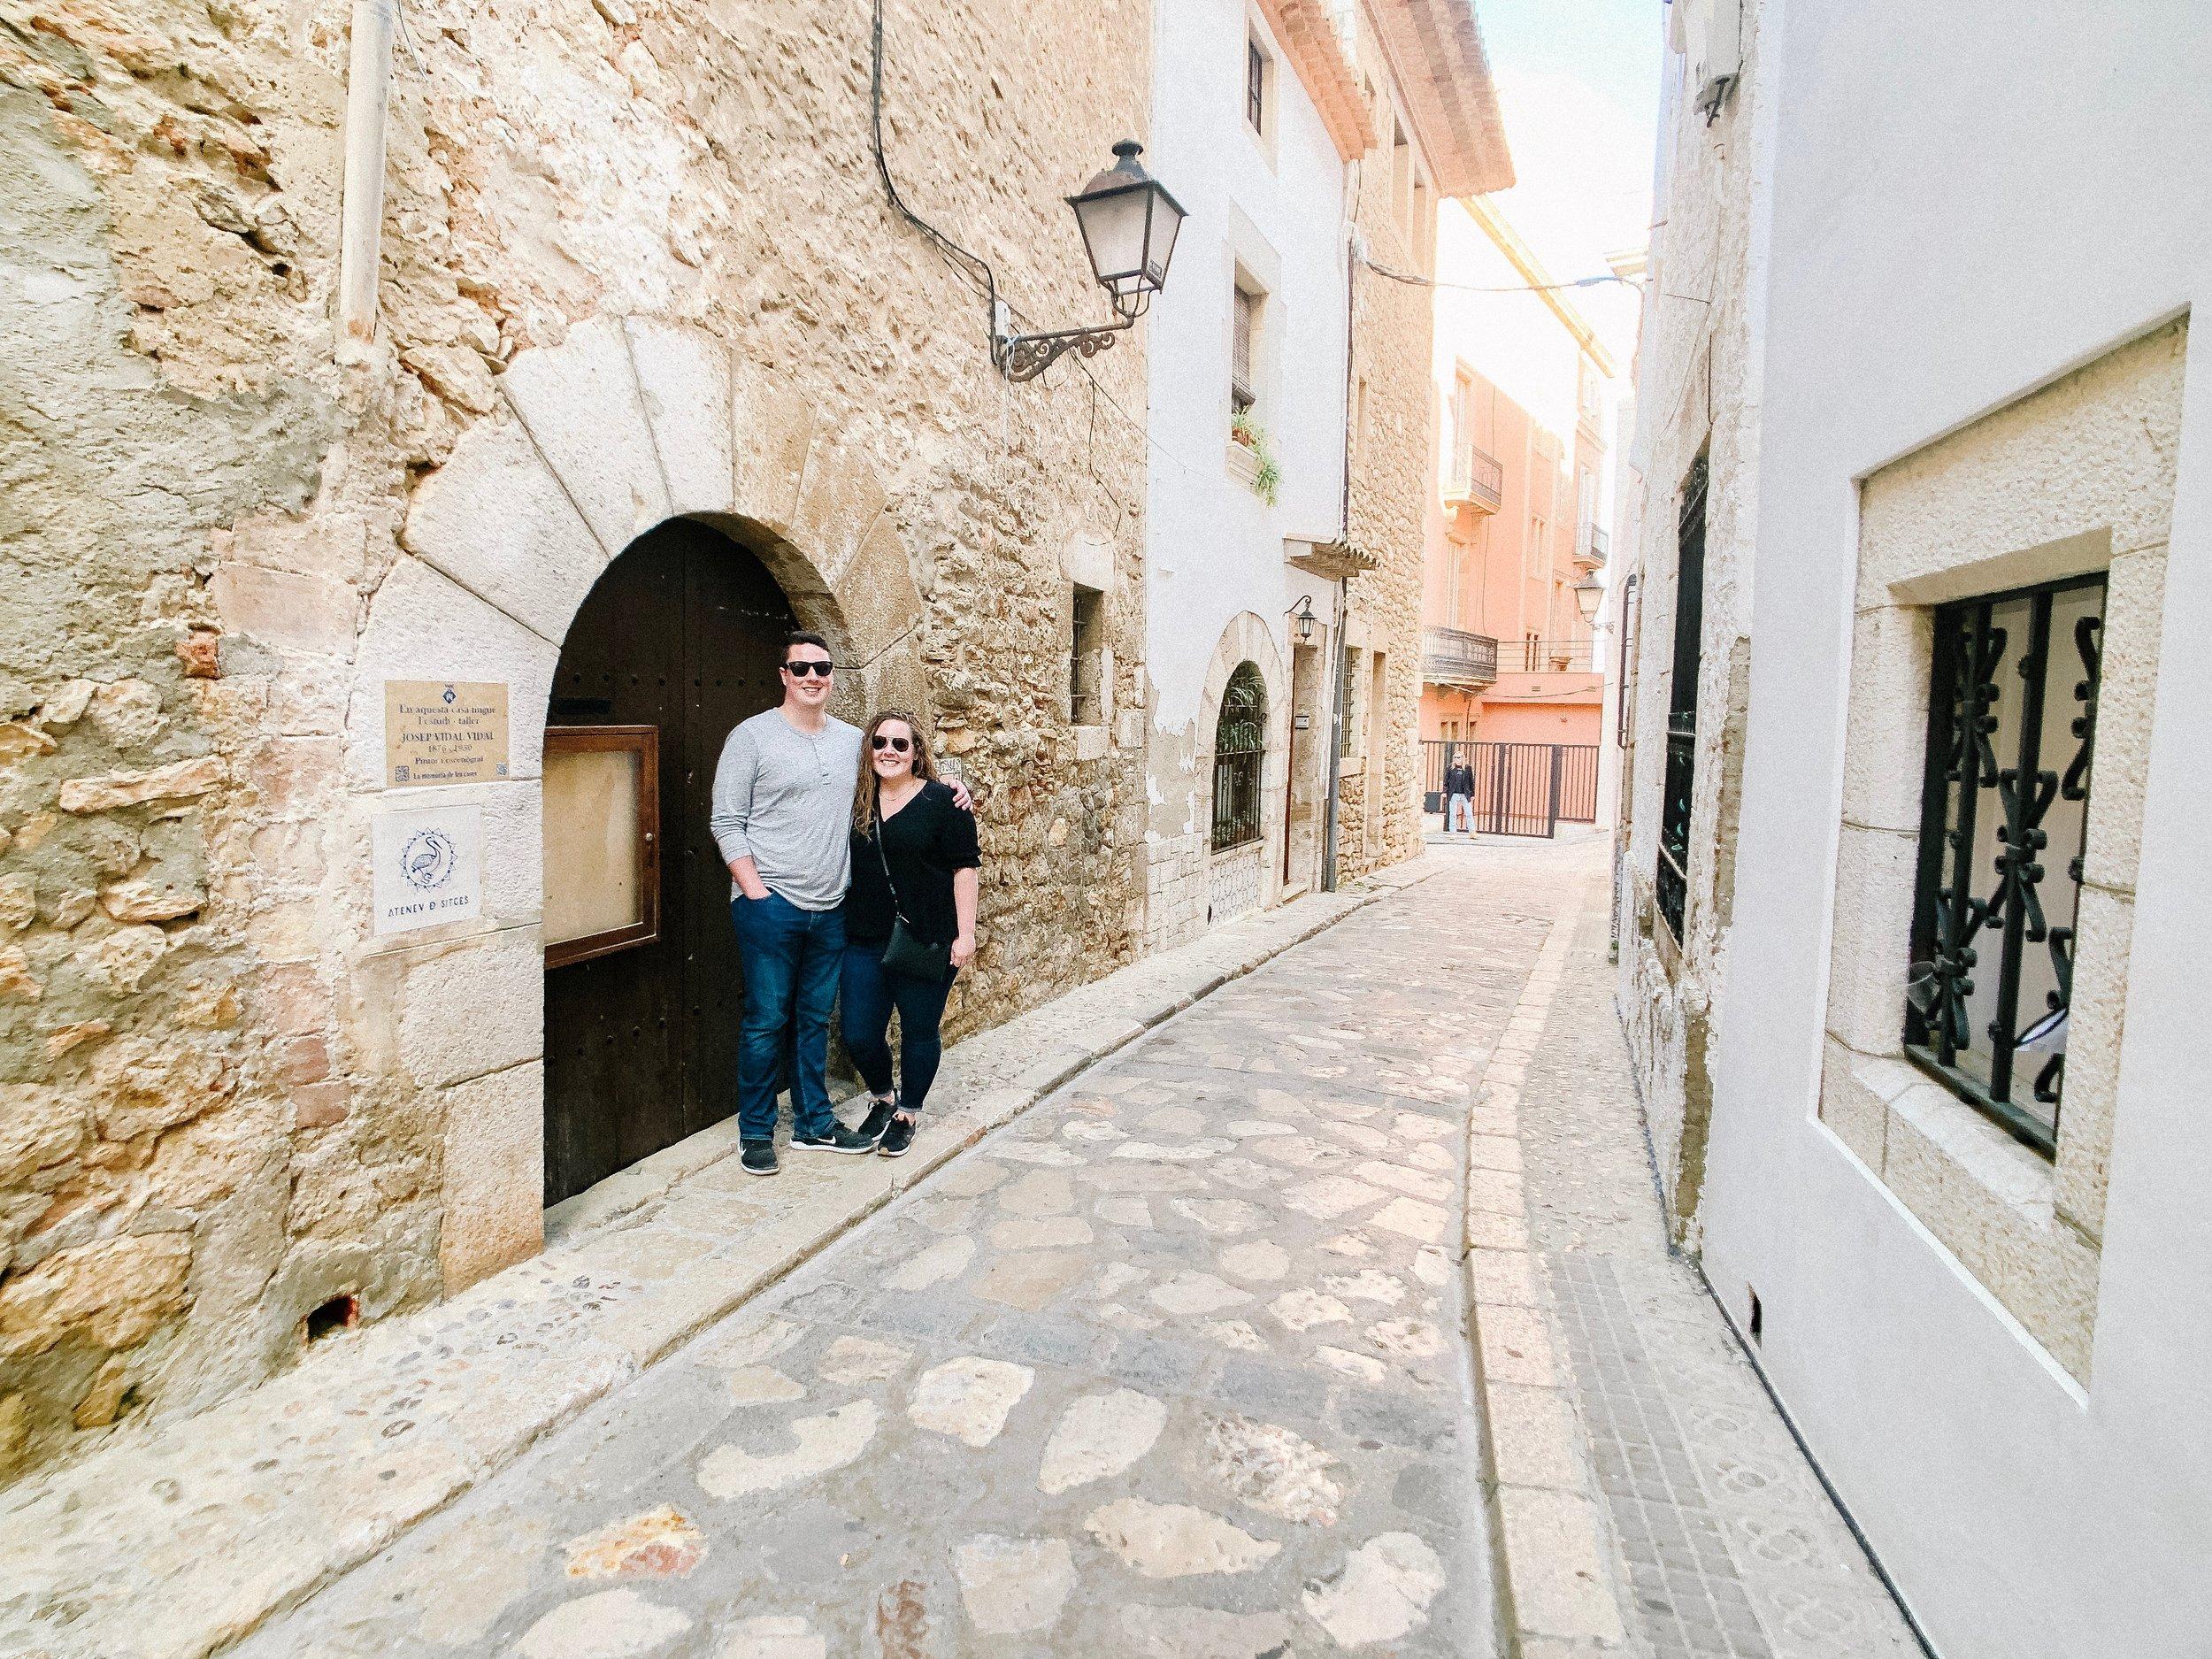 barcelona_honeymoon_sitges_2.jpg